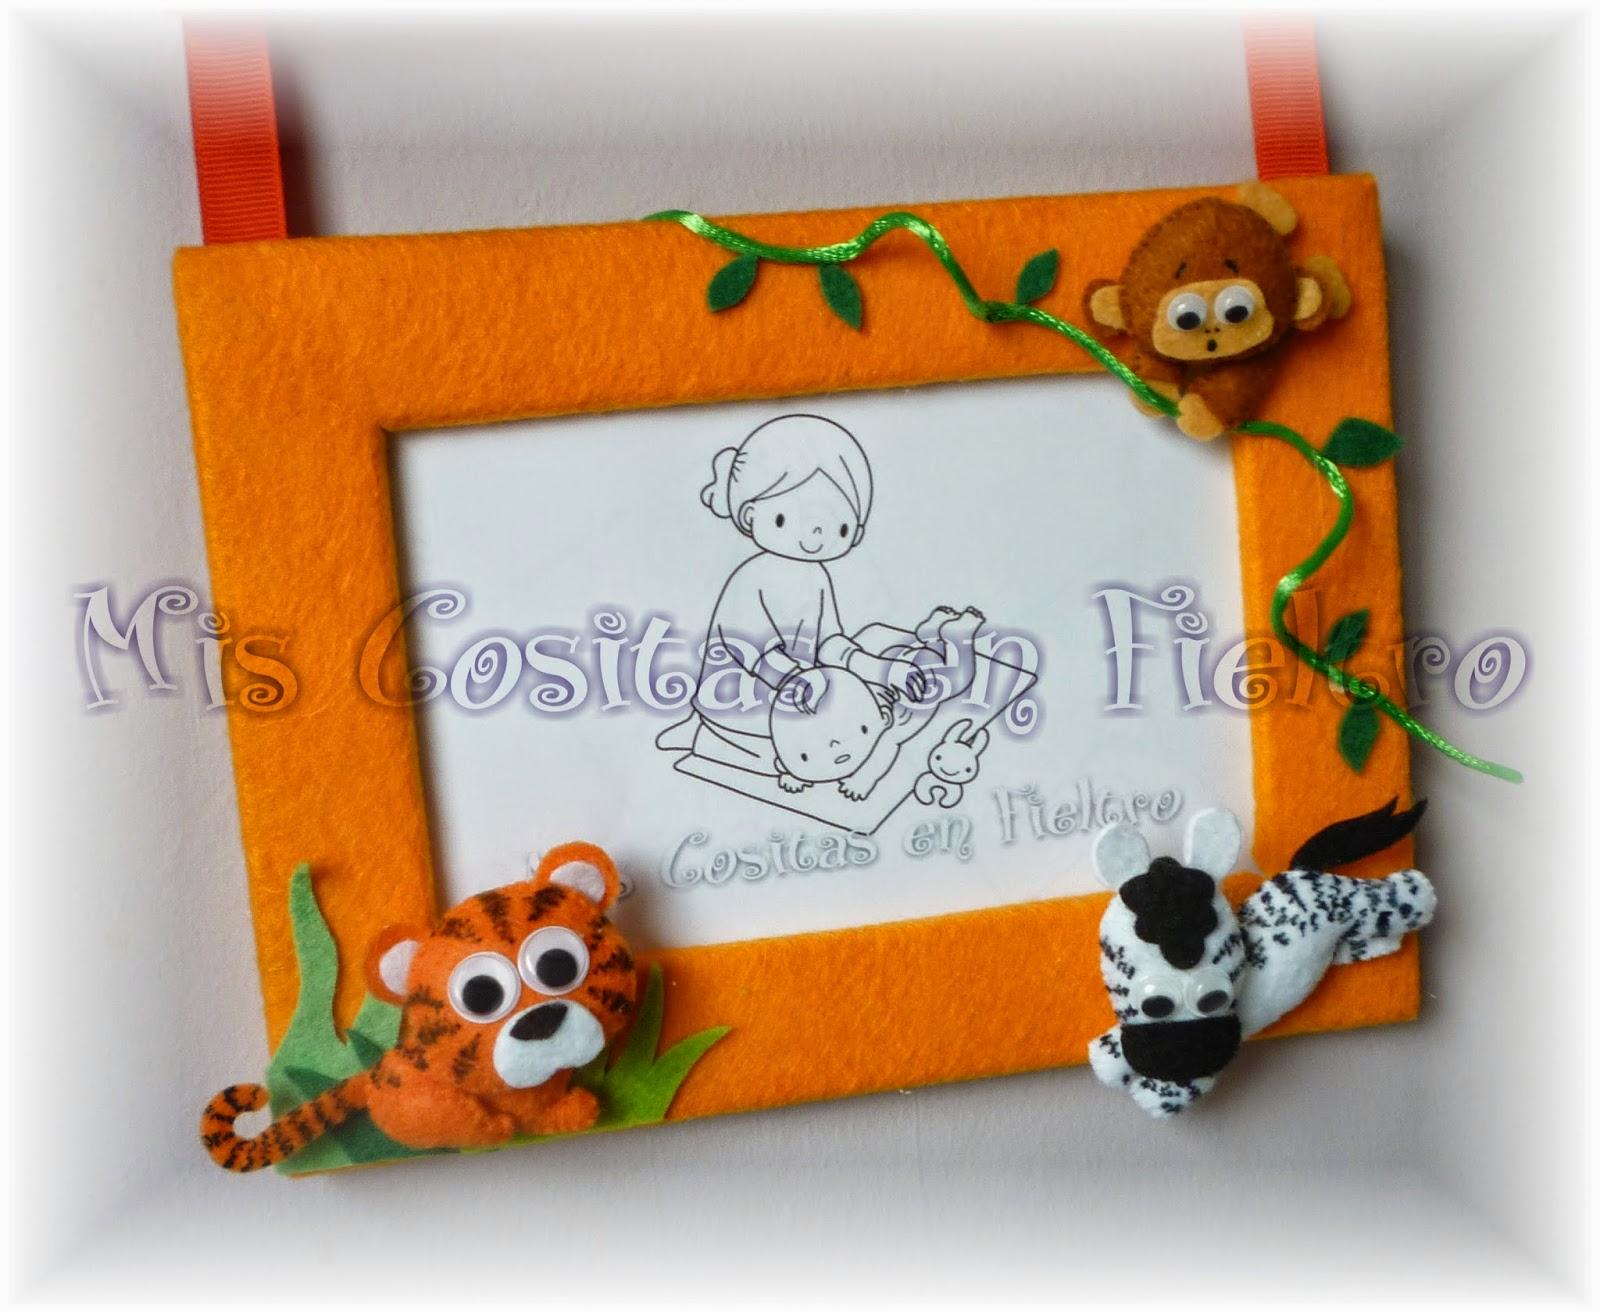 marco de fotos, portafotos, fieltro, animales, selva, león,   mono, lemur, jirafa, cebra, nombre, elefante, hipopótamo,